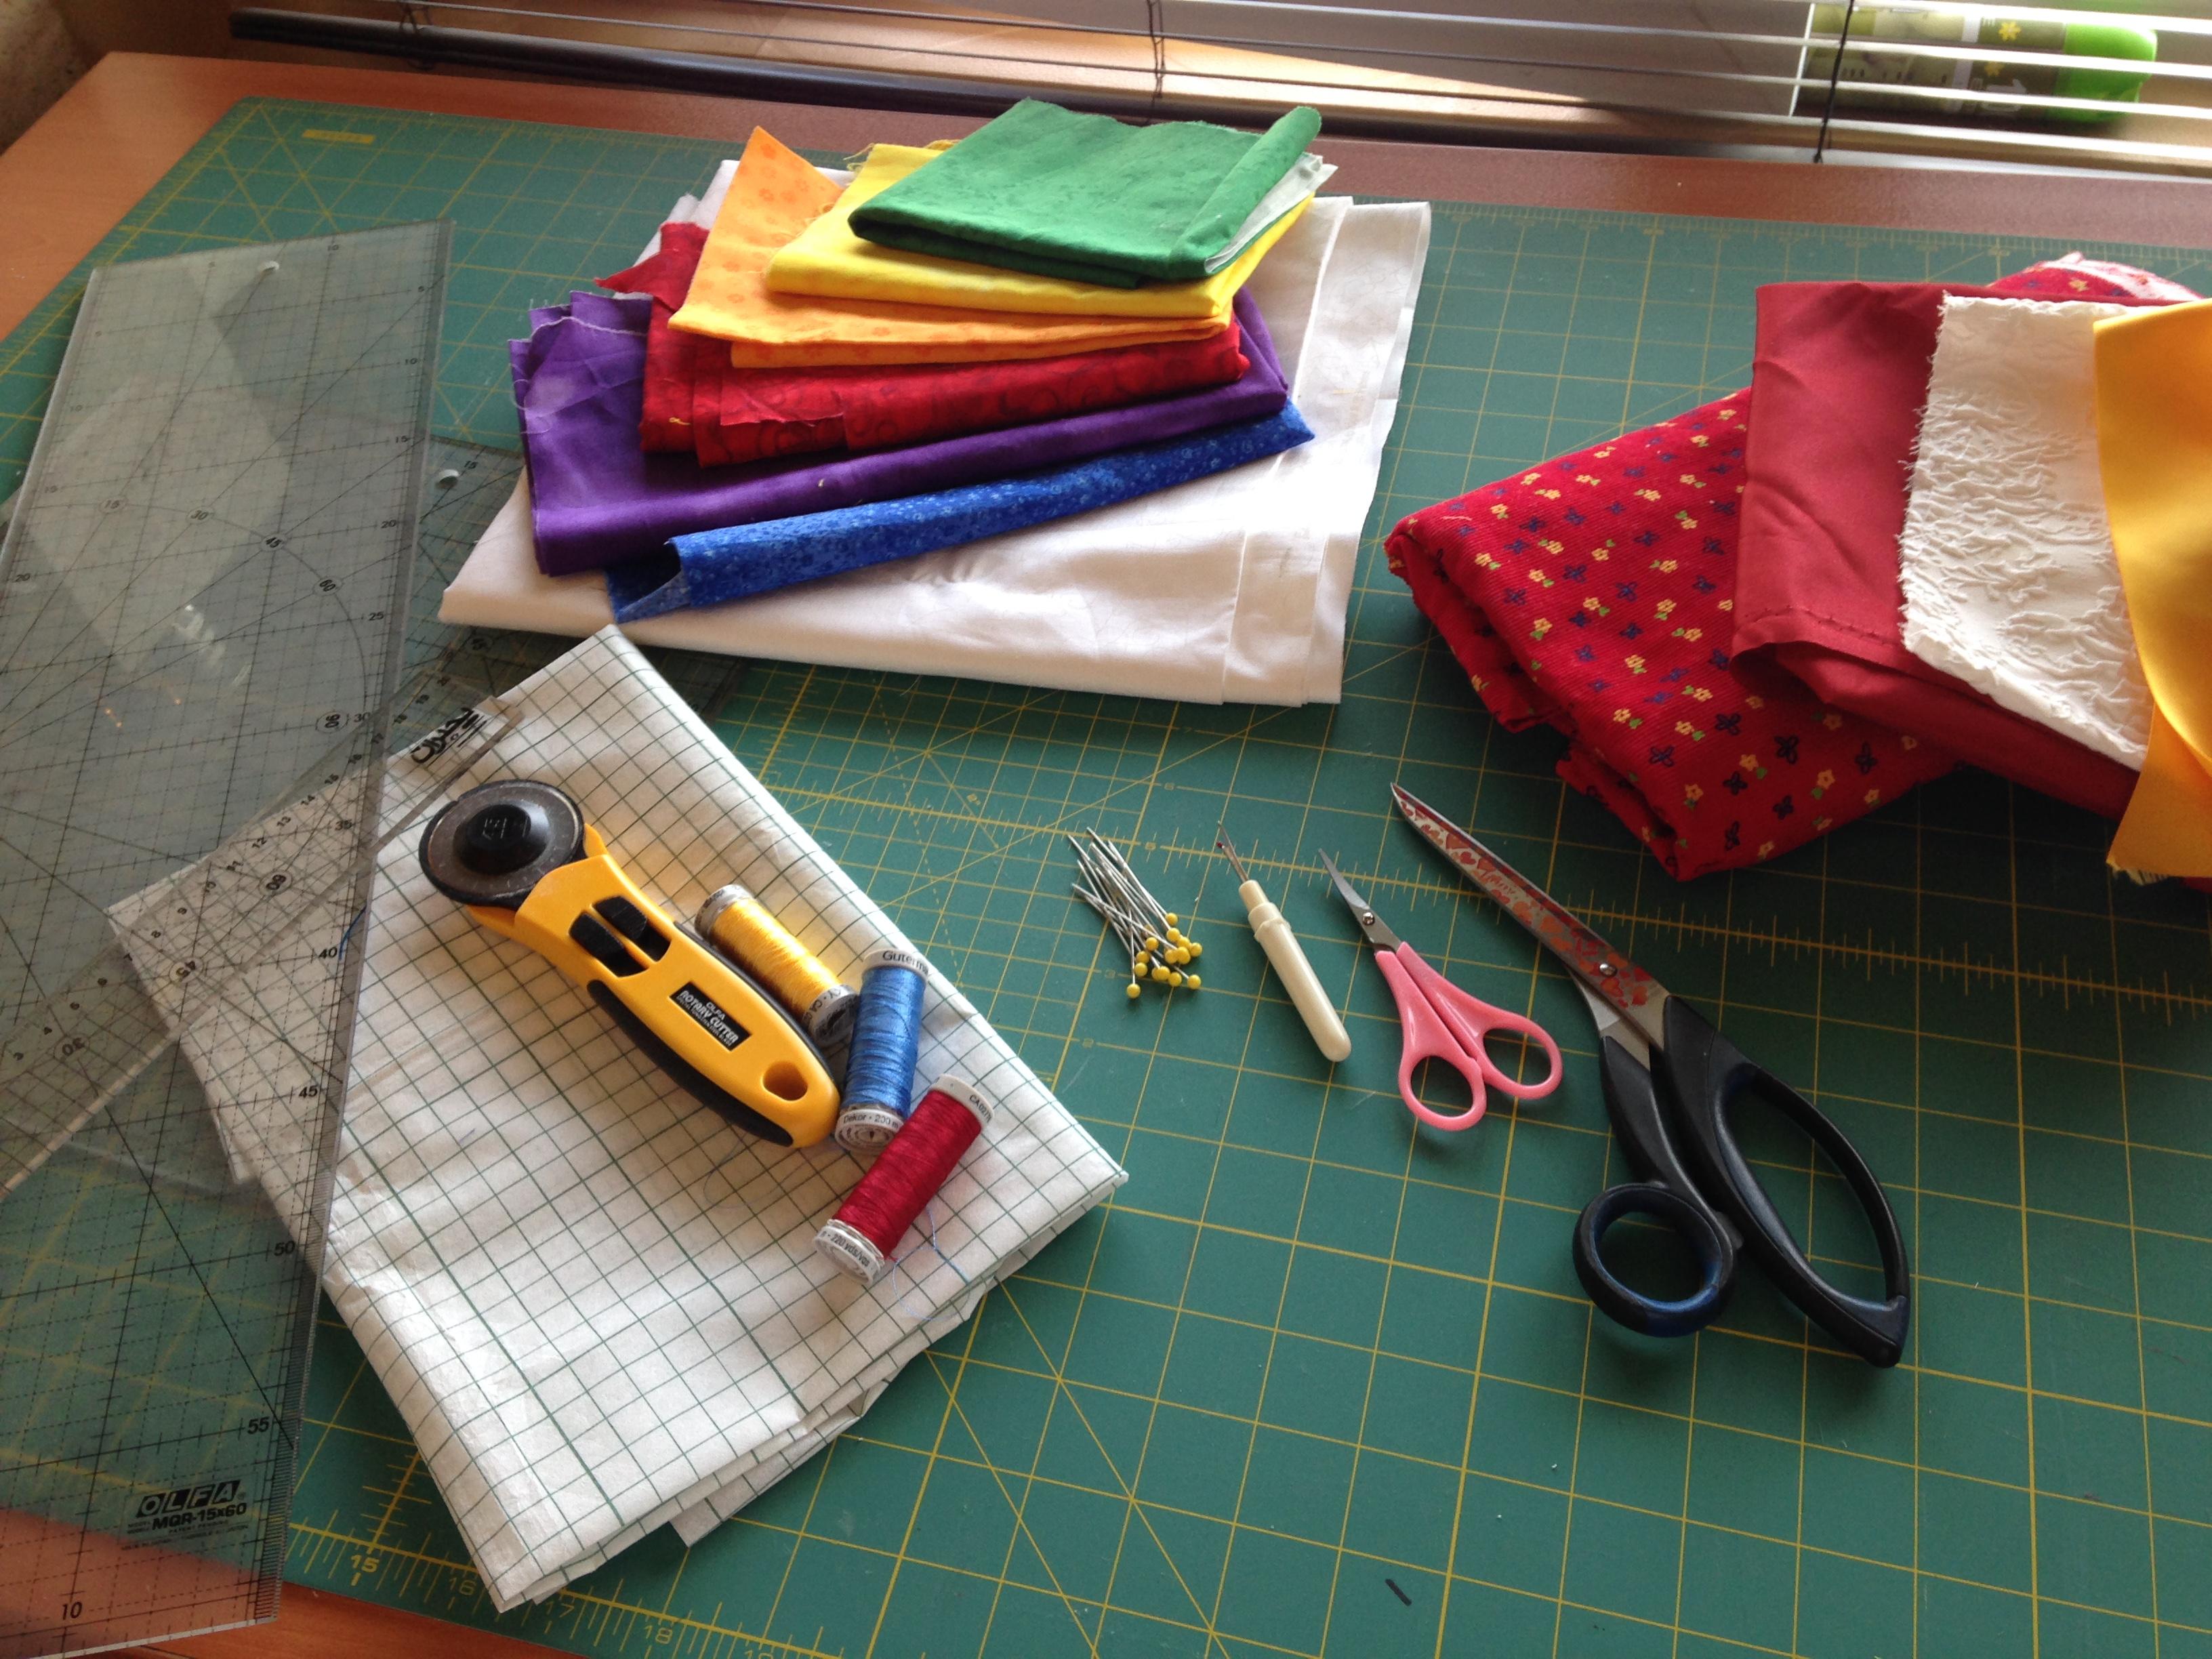 preparation of equipment and fabrics